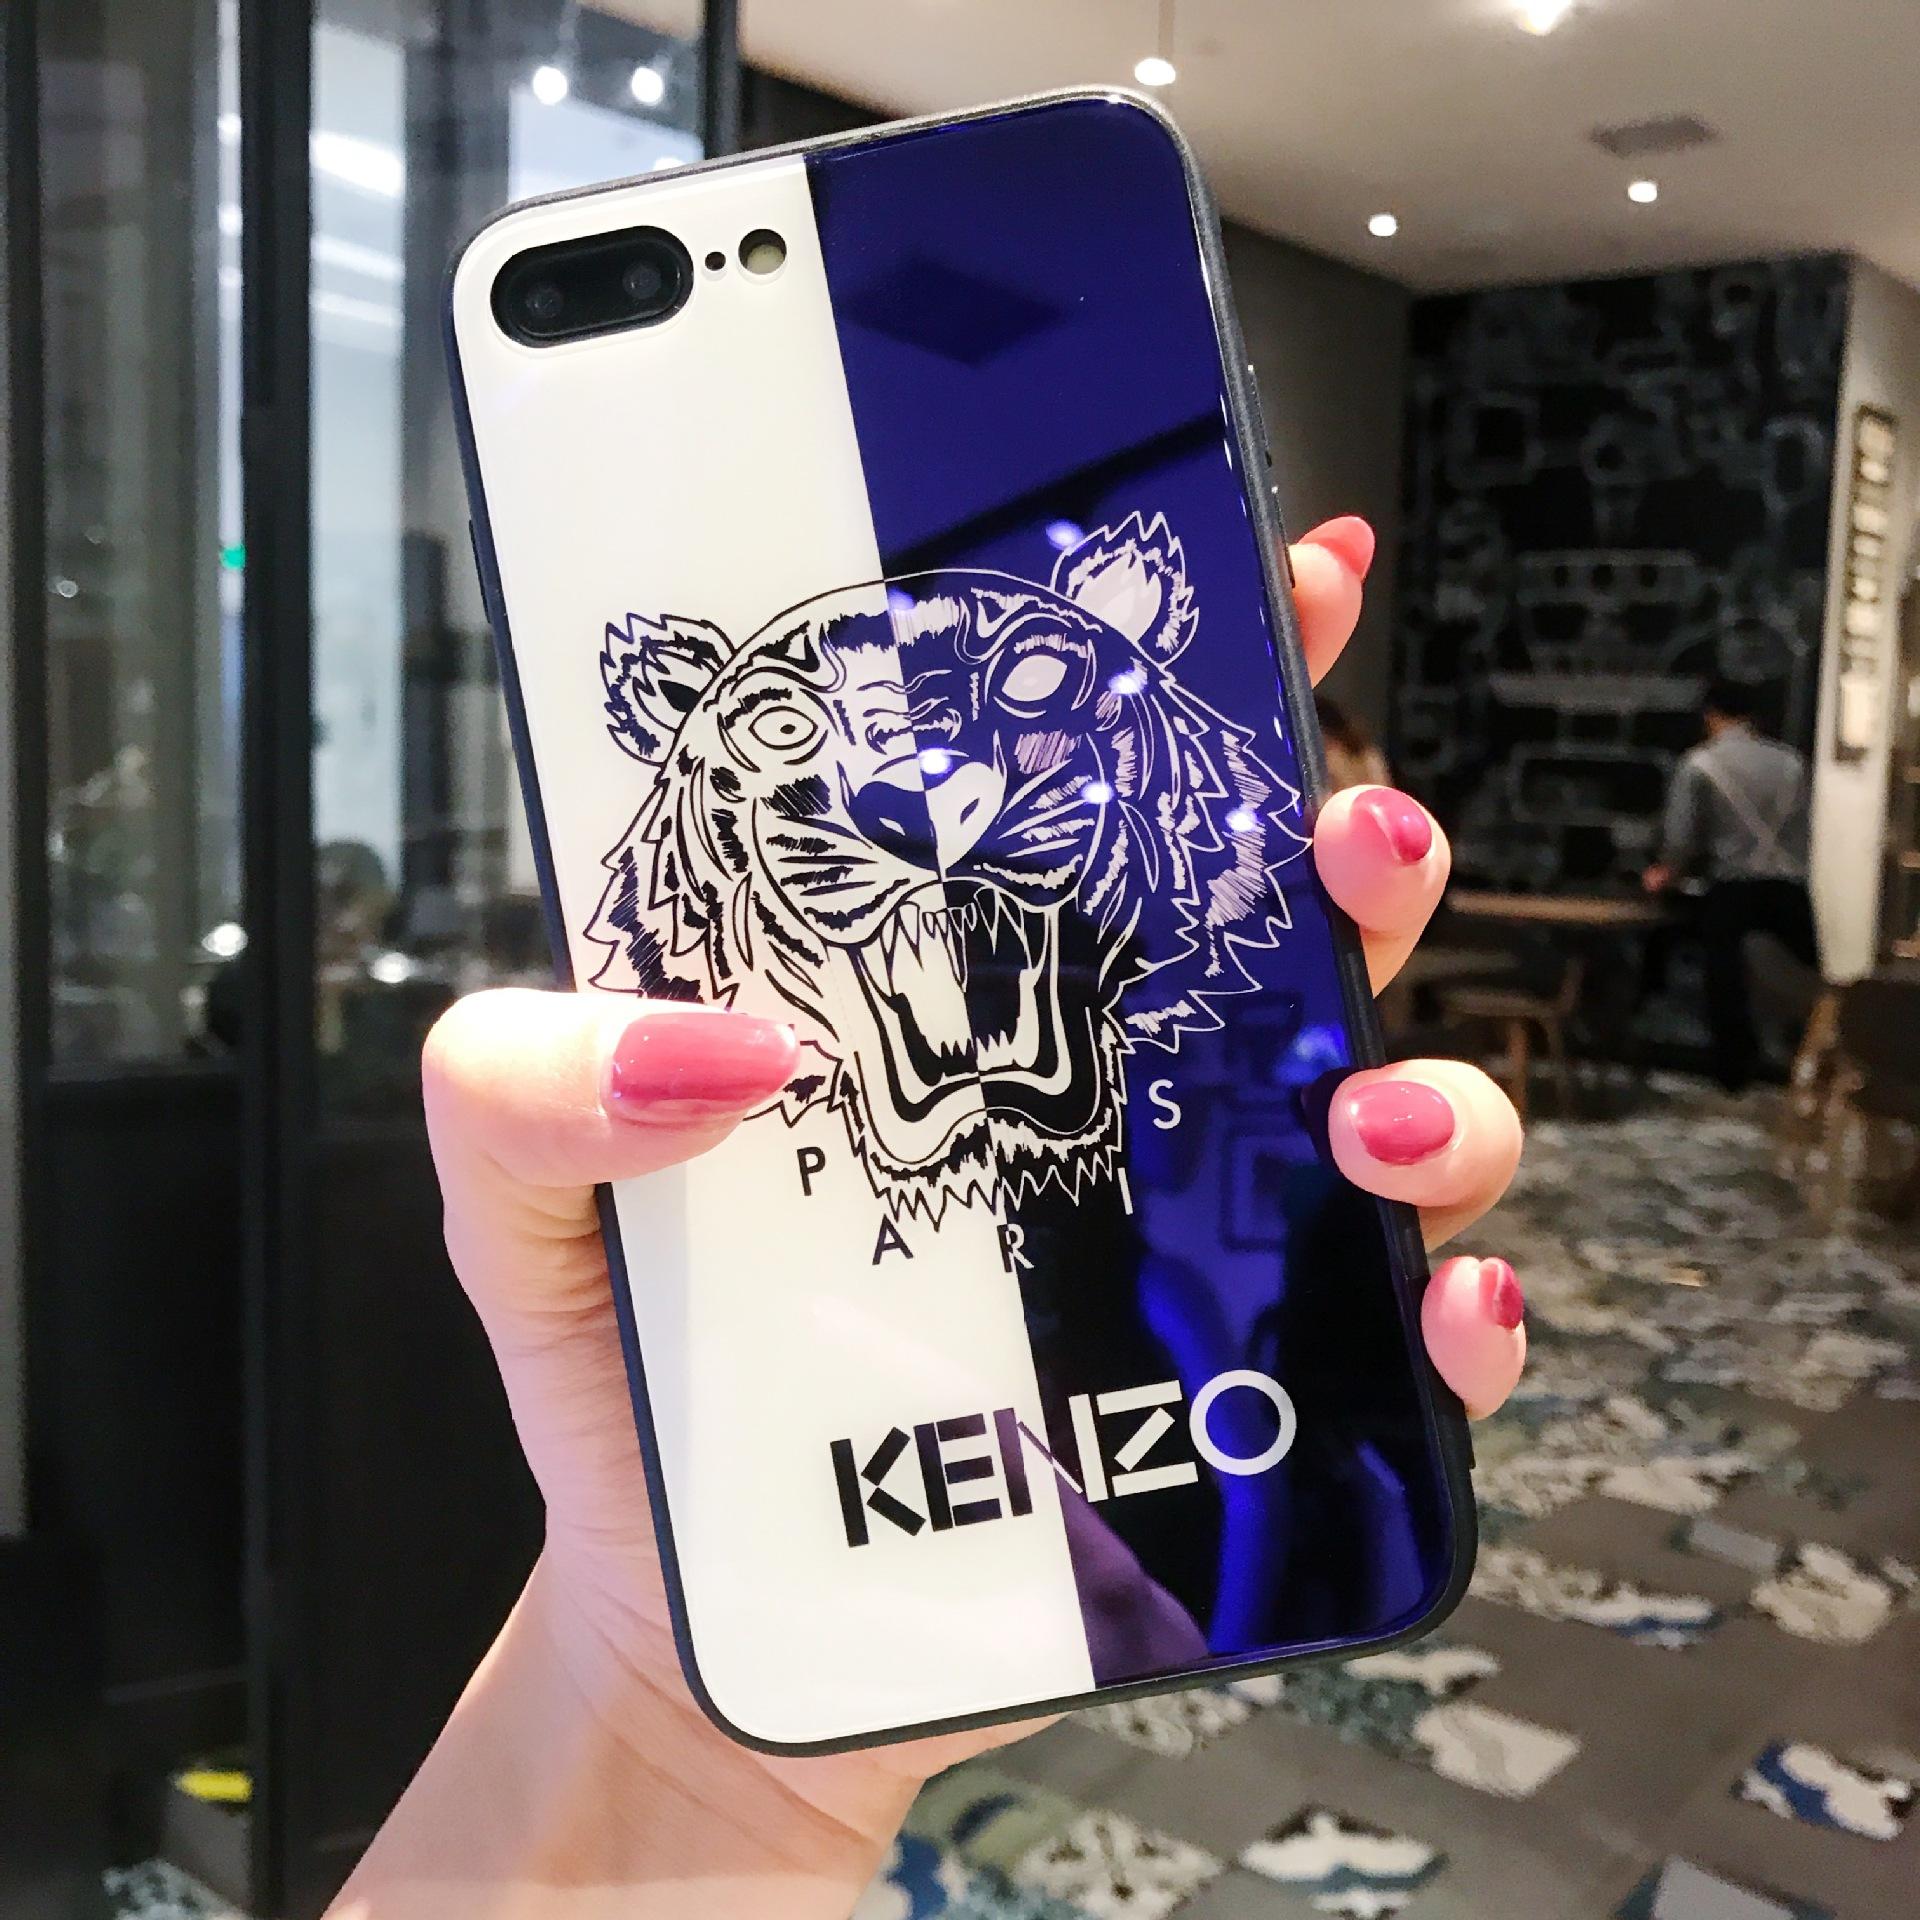 Barato Tiger pintado marca Blue Ray vidrio templado I caja del teléfono TPU contraportada para IPhoneX 7 / 8P 7/8 6sP iPhone 6 / 6s es disponibles